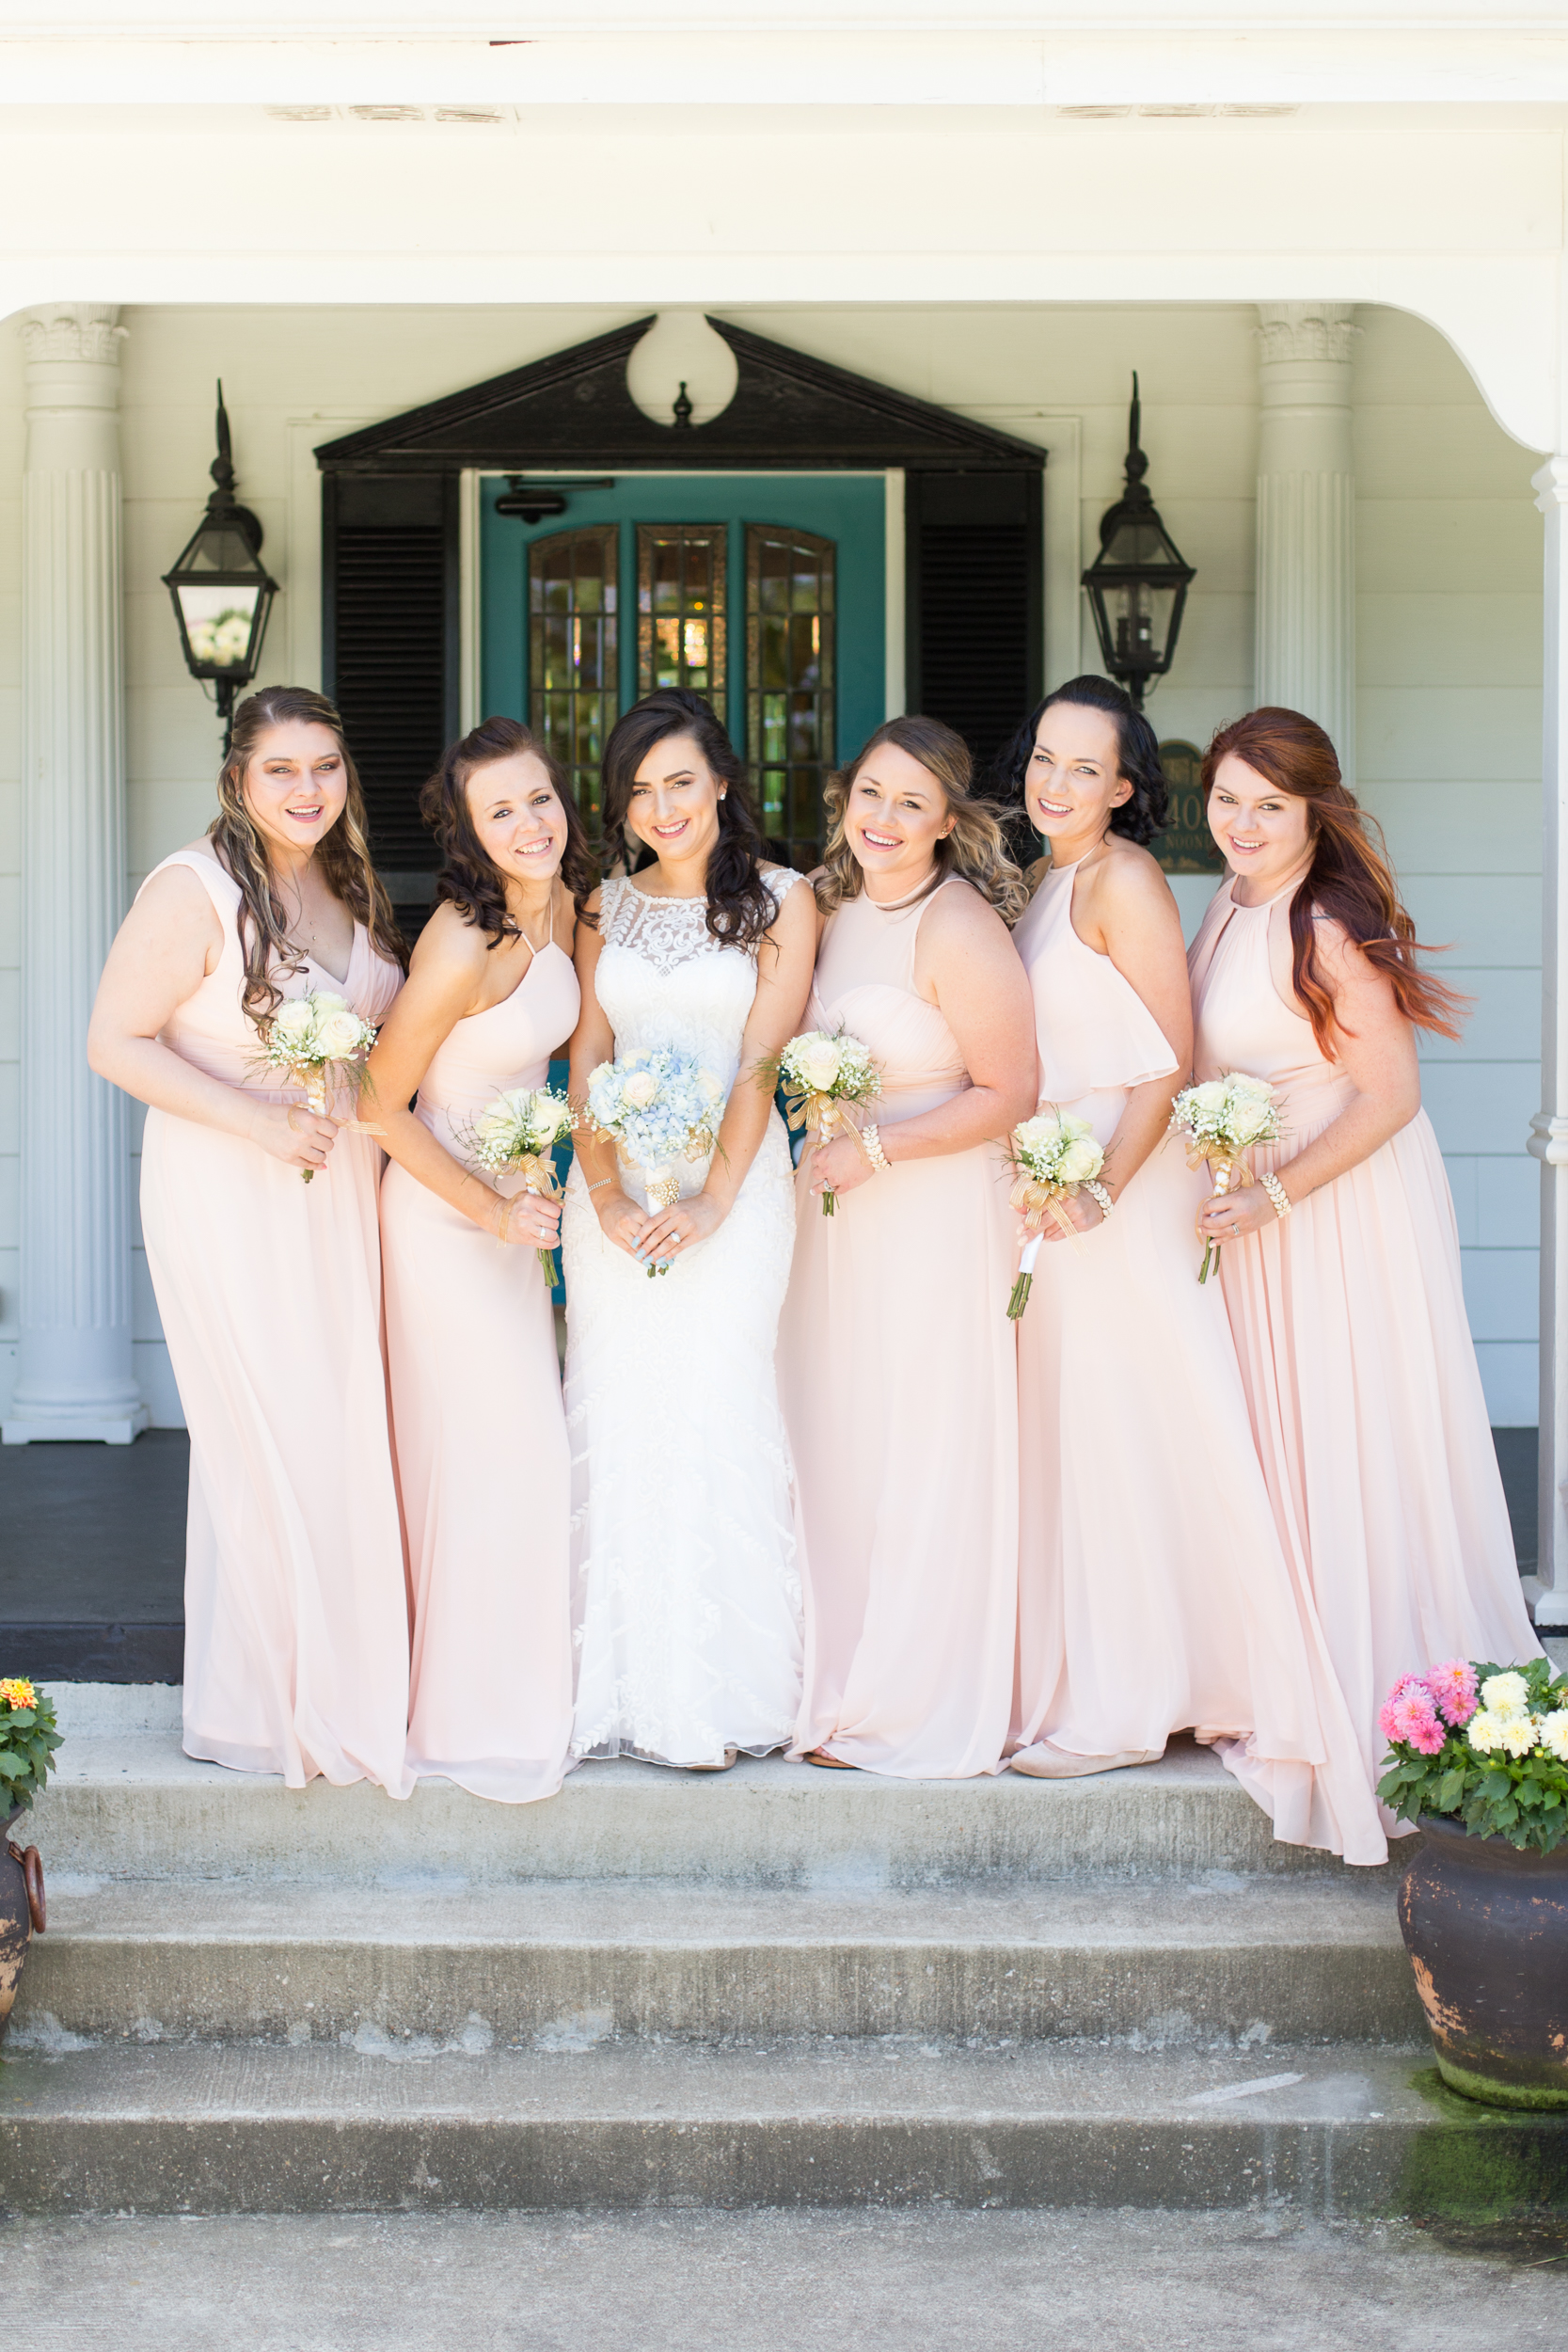 Zihlman-East TX Wedding_Kelsie Hendricks Photography_The Folmar Tyler Texas-64.jpg